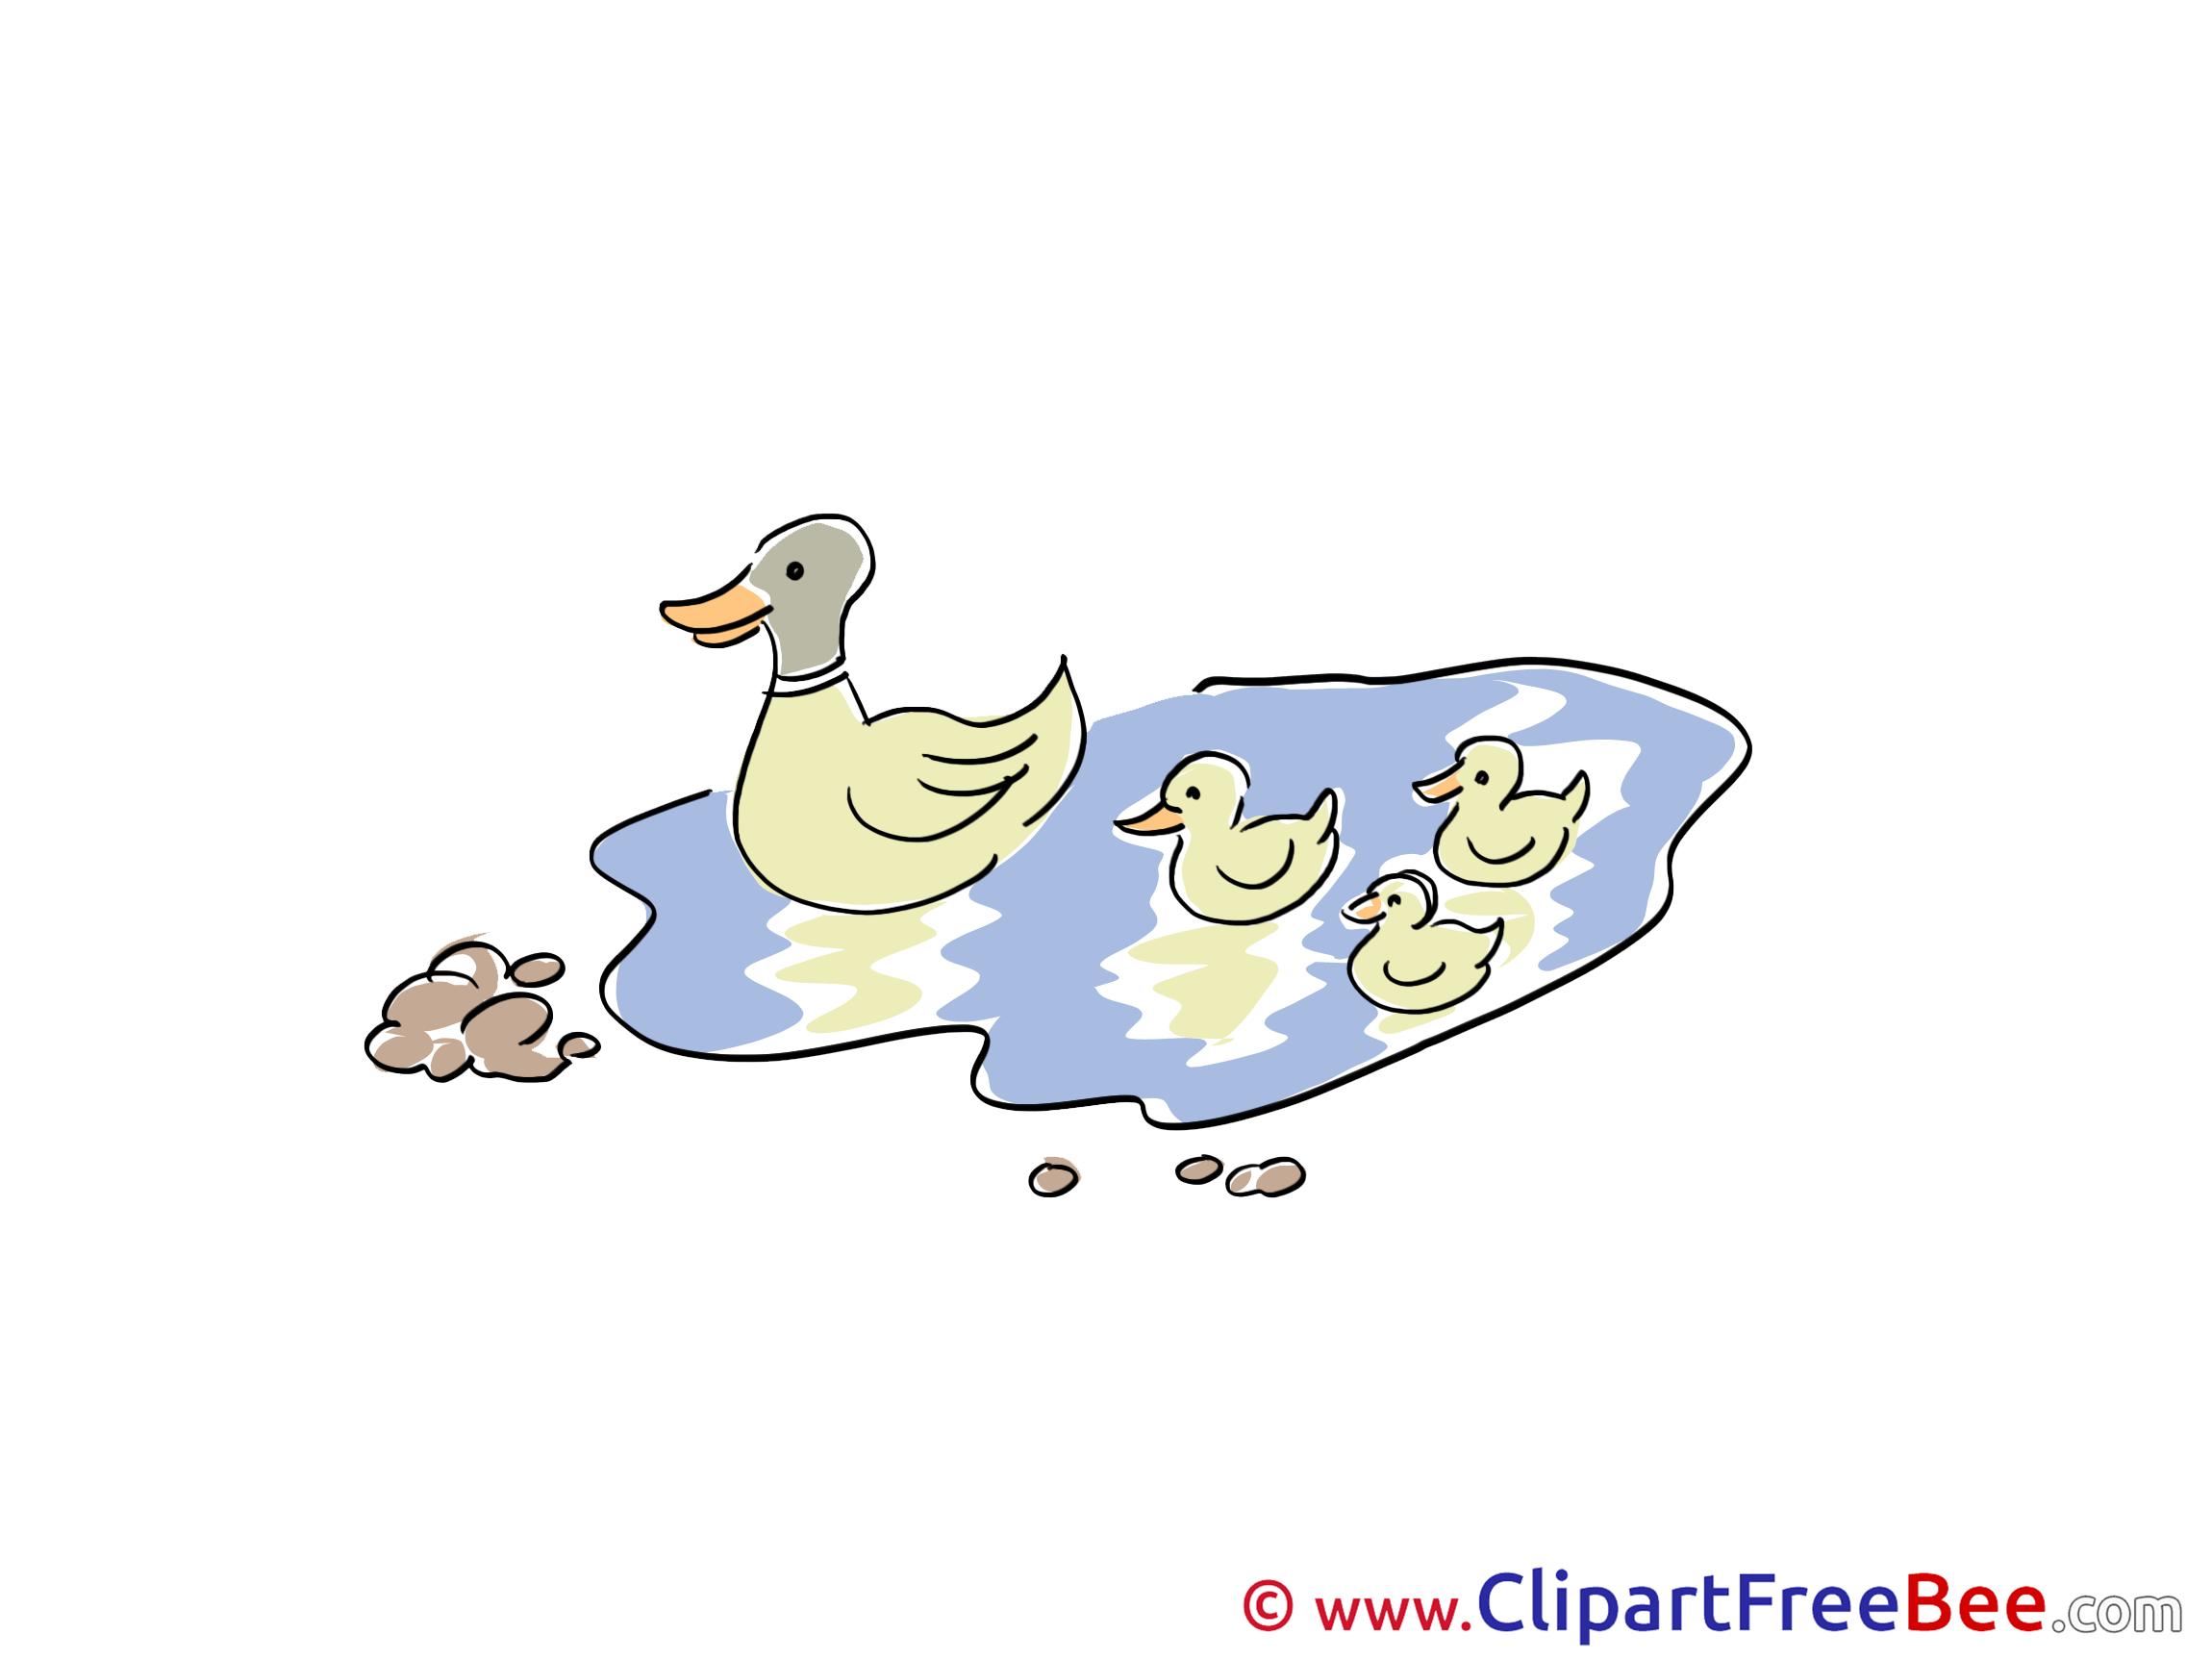 Lake Ducks printable Illustrations for free